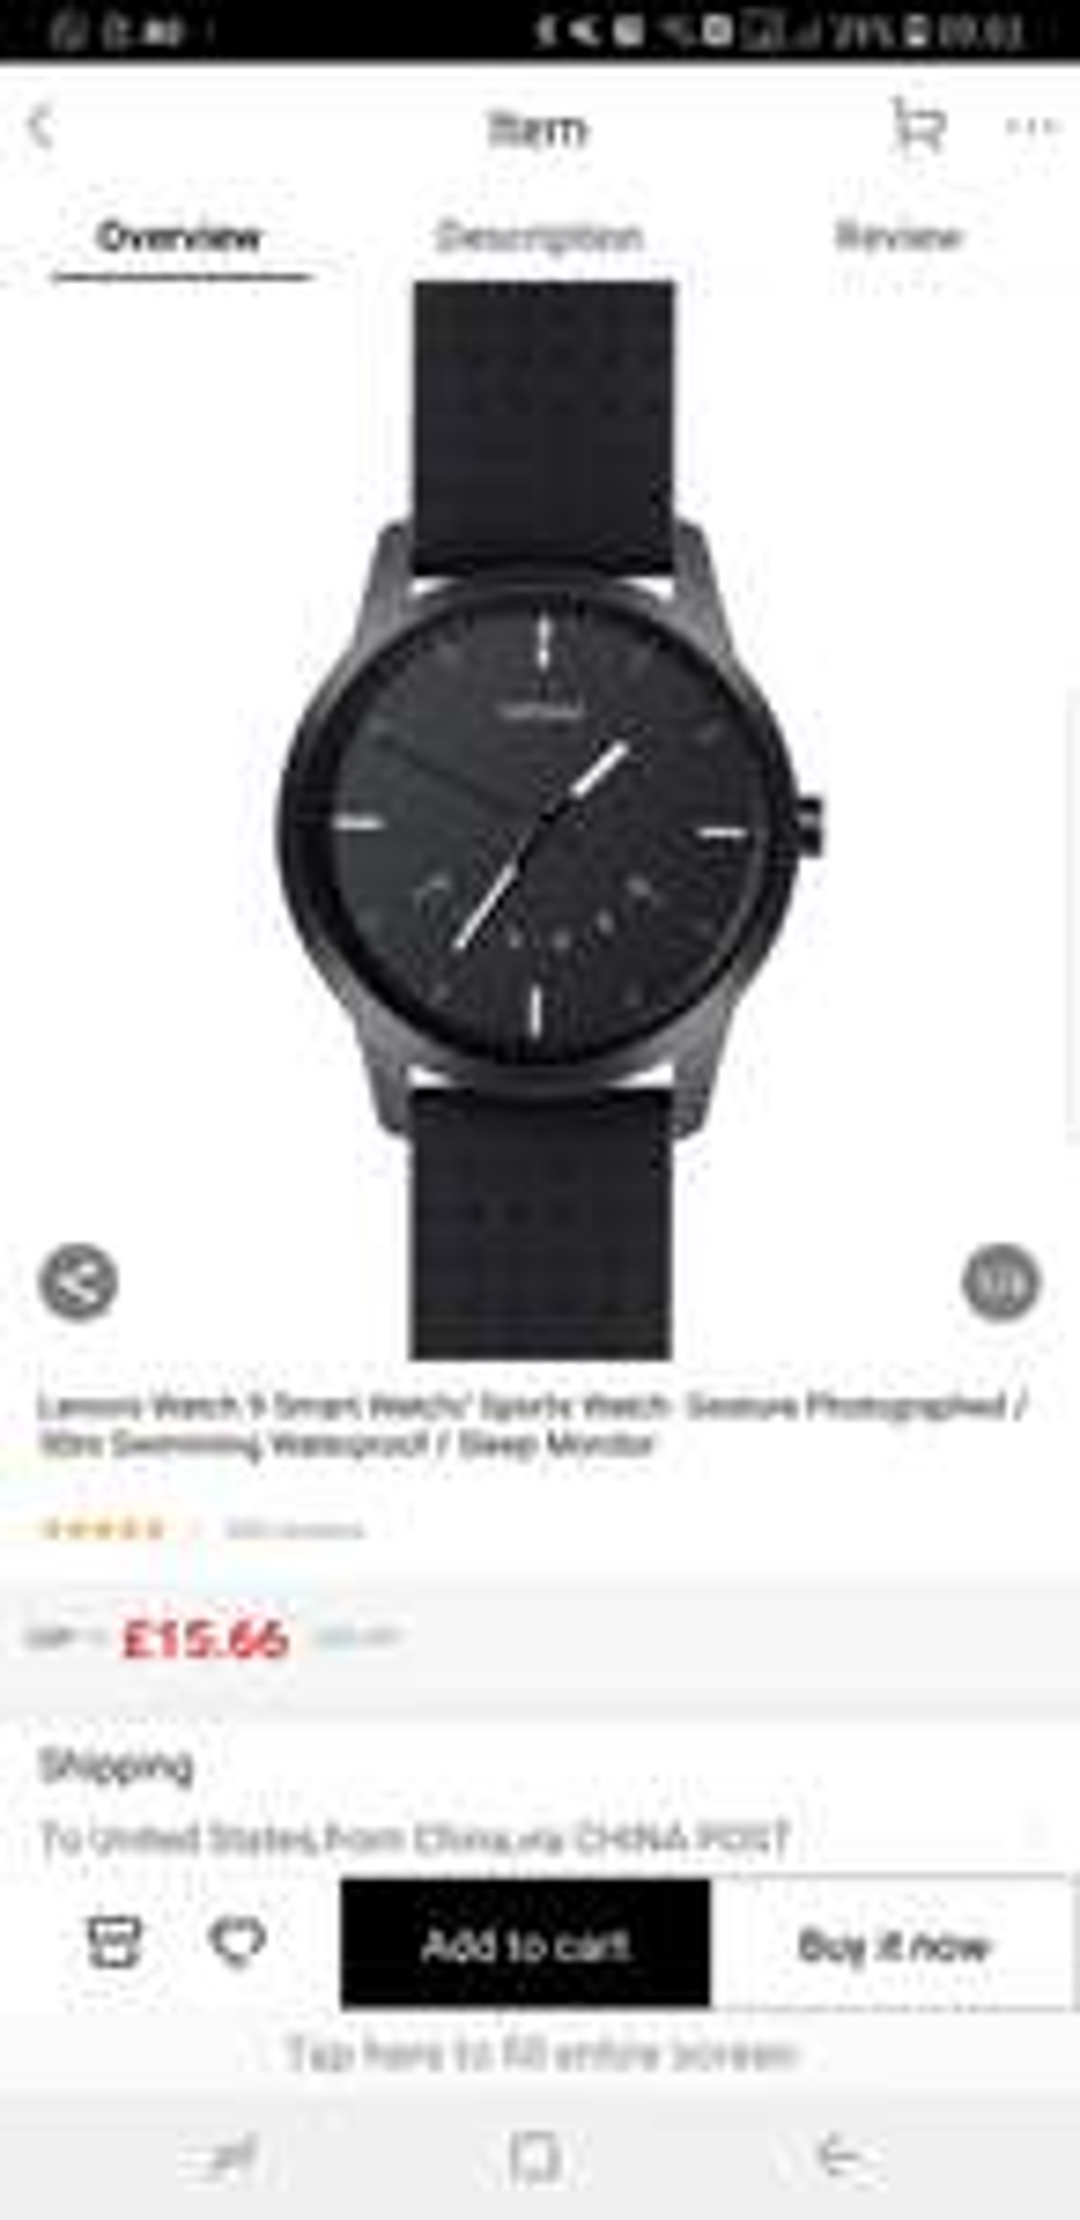 Lenovo Watch 9 Smart watch. Free shipping £15.66 joybuy